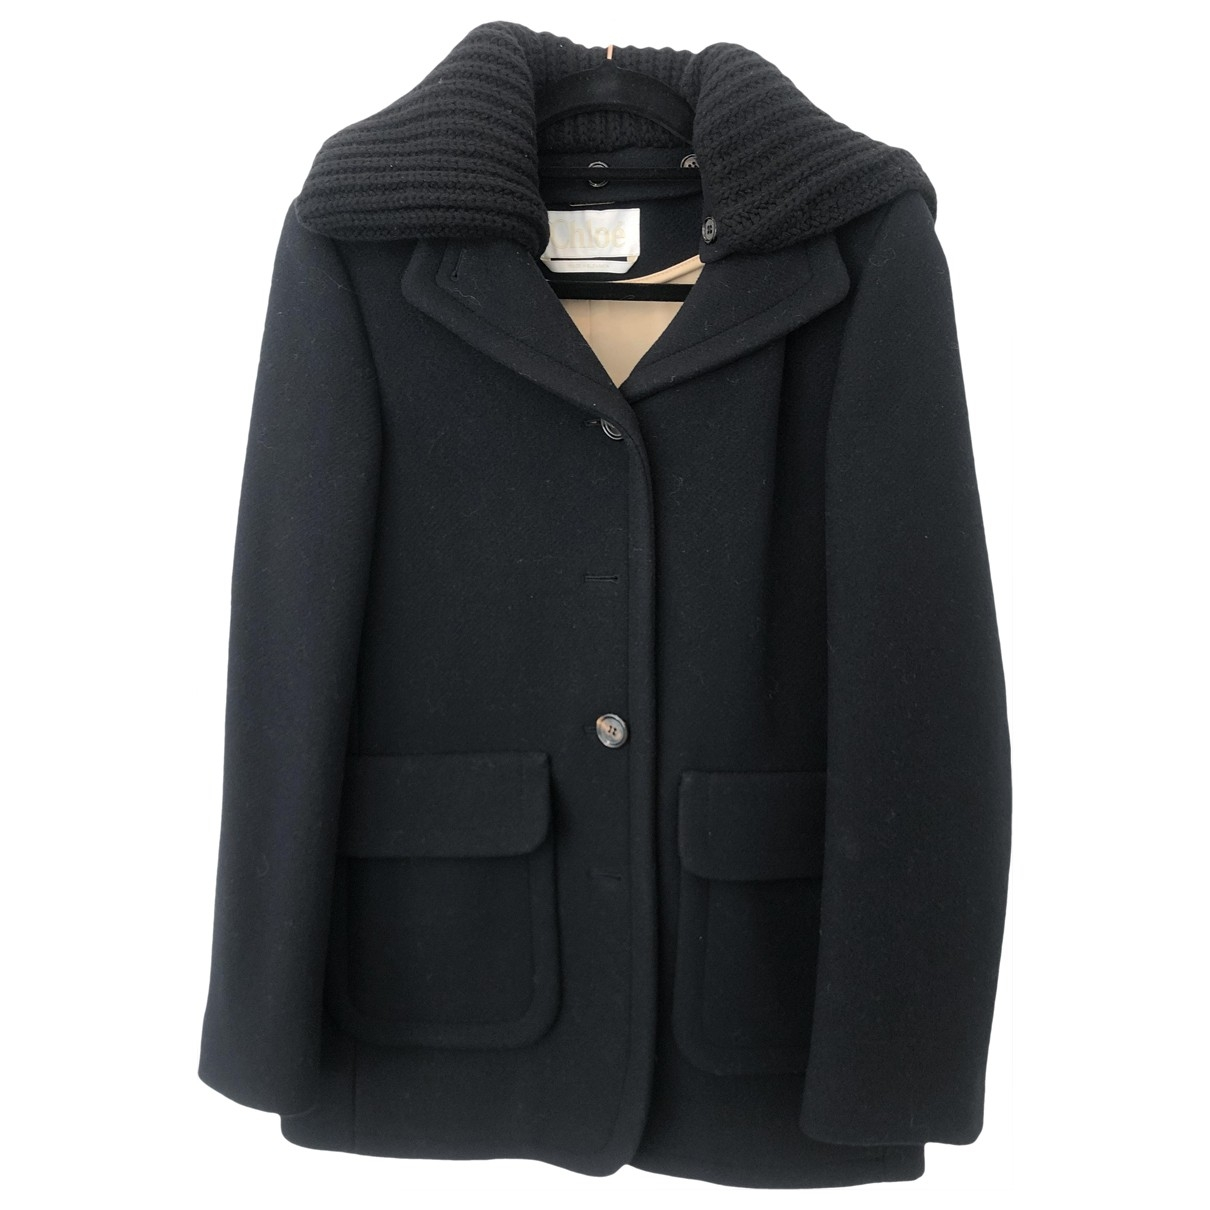 Chloé \N Navy Wool coat for Women 34 FR